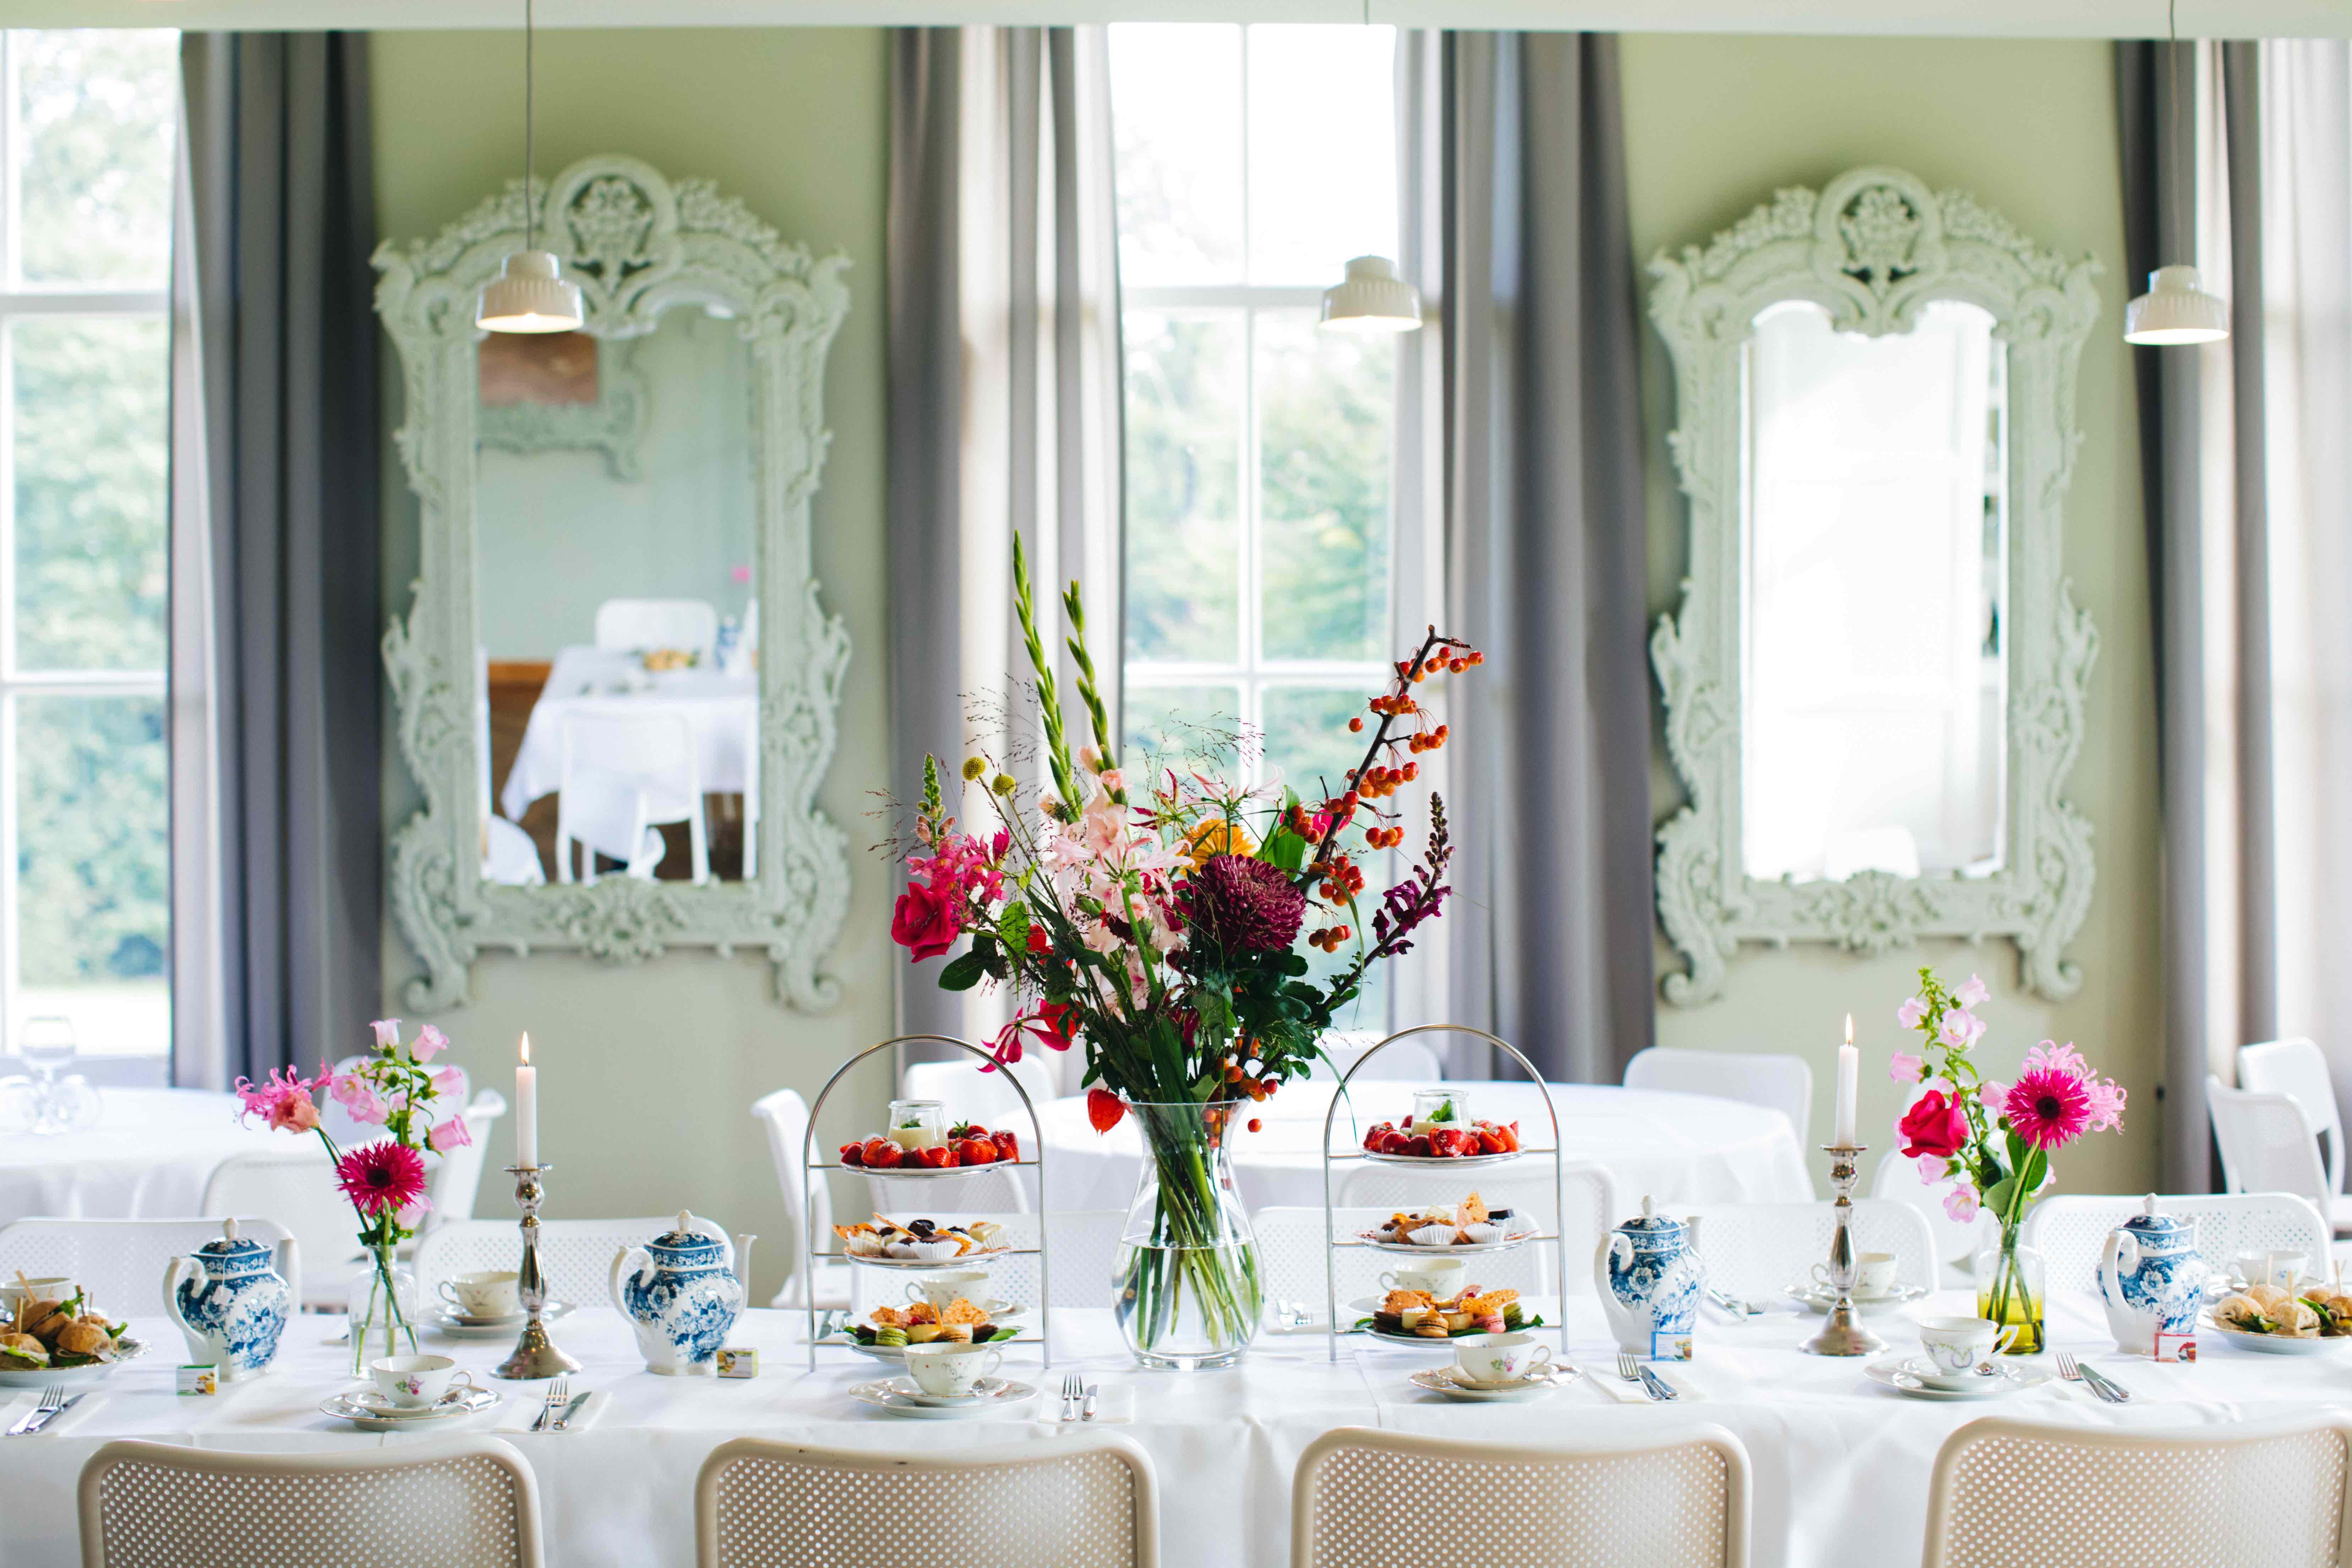 High Tea Stadsvilla Sonsbeek Park Arnhem locatie huwelijk trouwen babyshower diner grand café zakelijk bijeenkomst